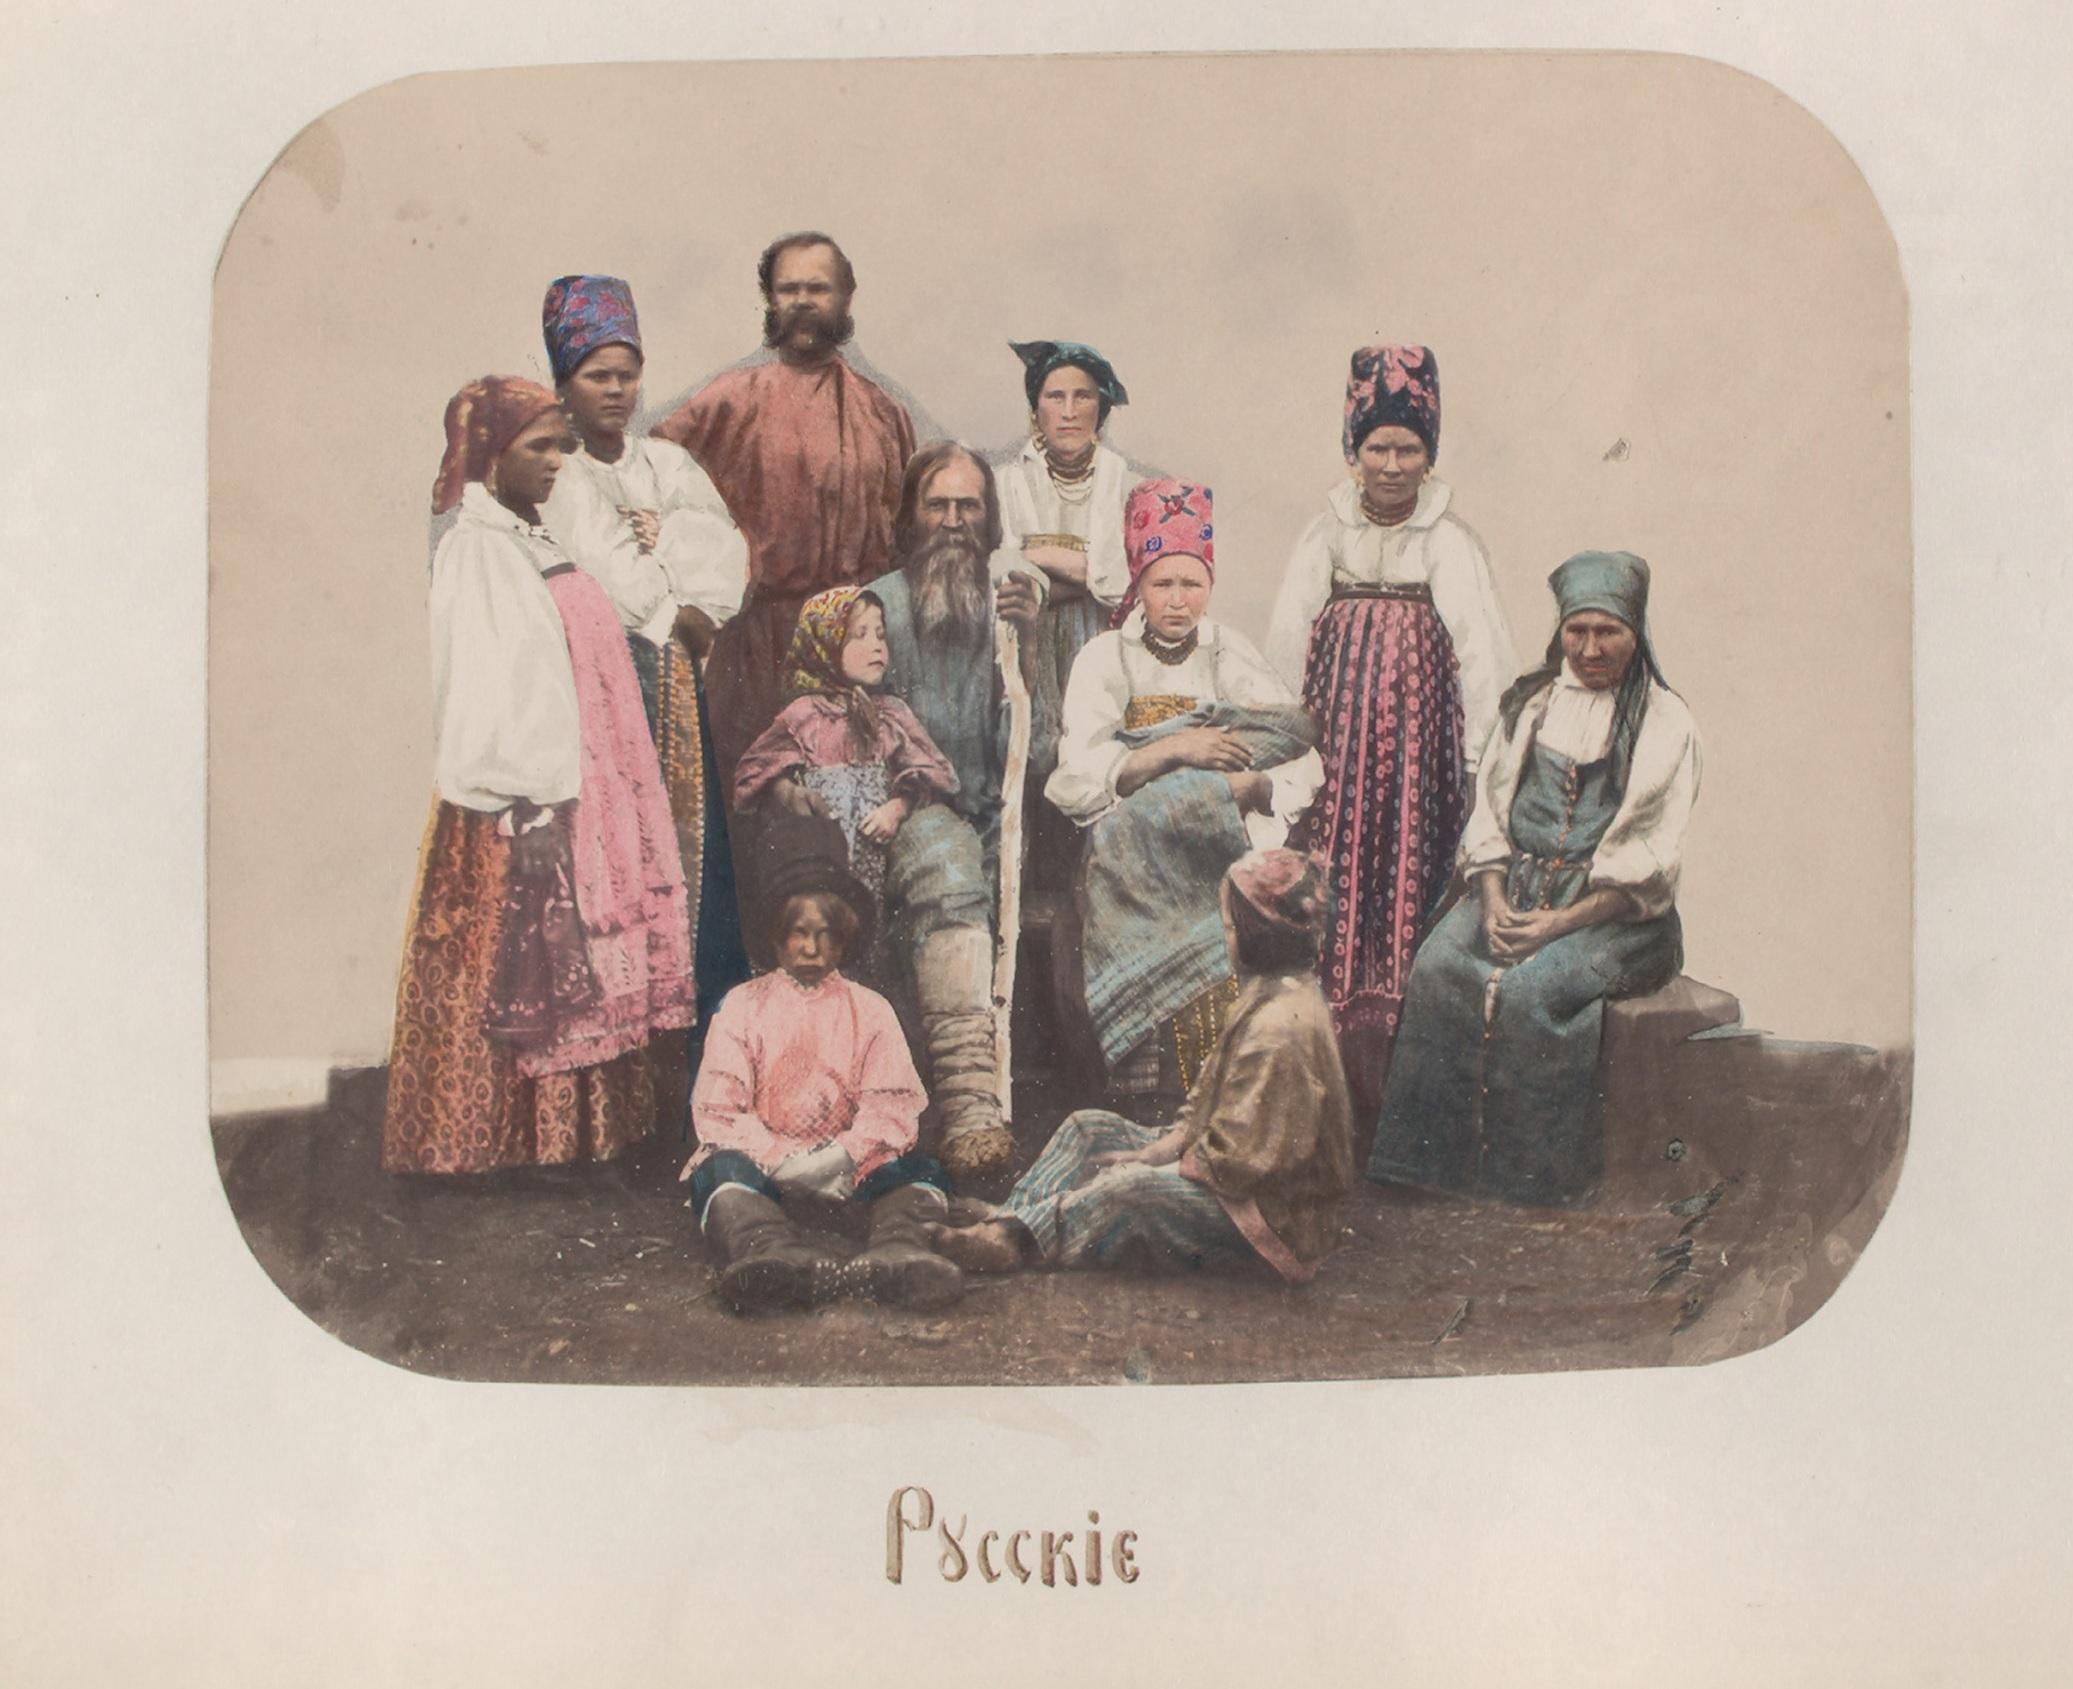 Bevölkerung Pensa Russland 1862 NYPL 4